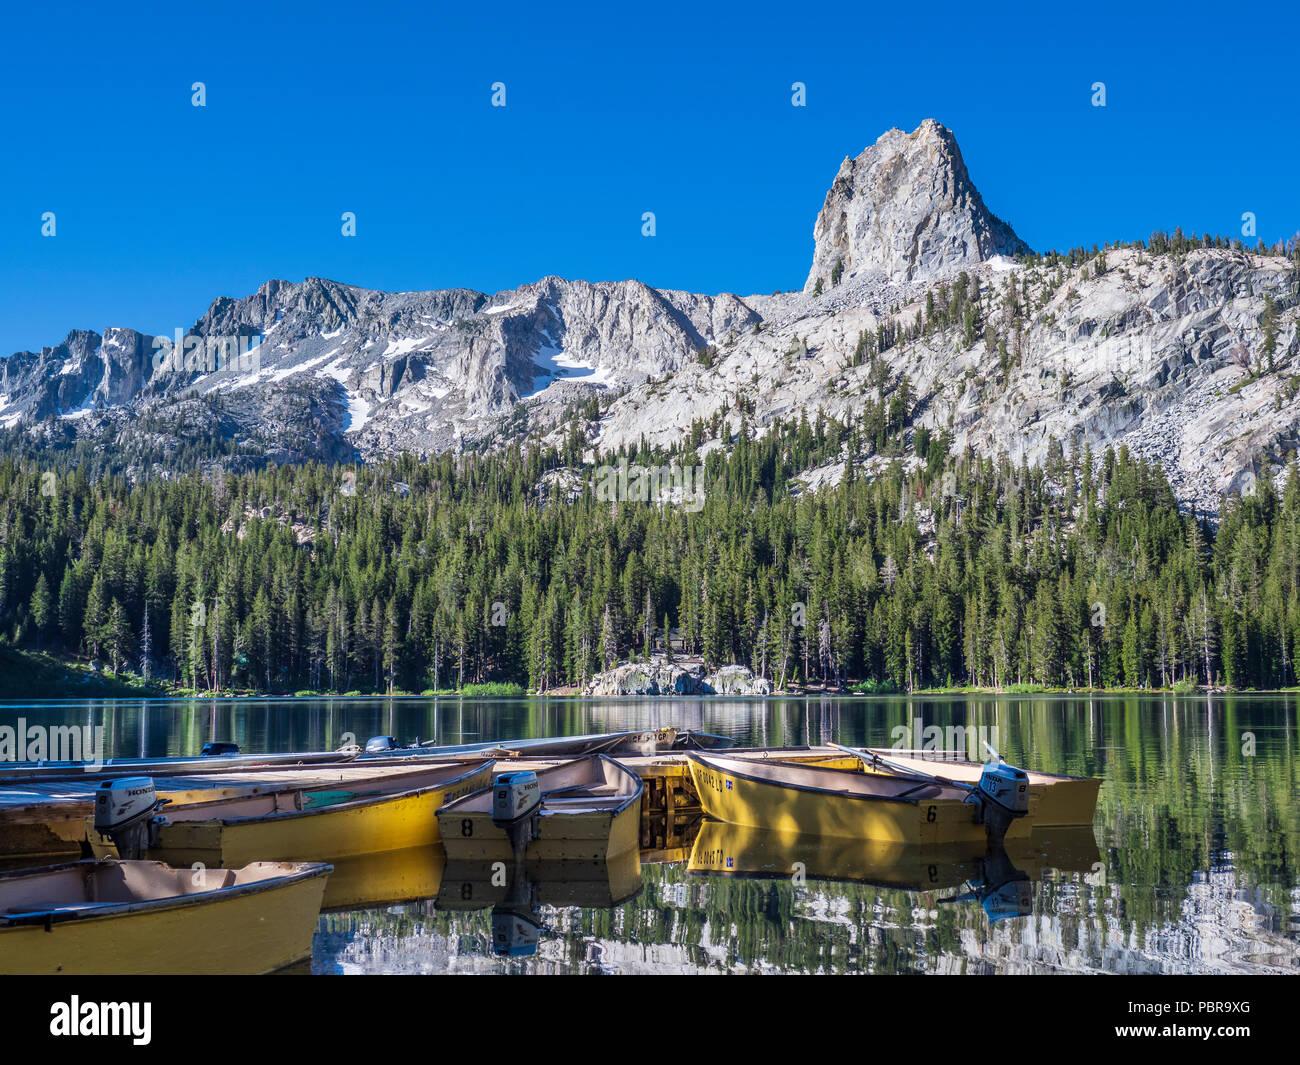 Boats at the dock, Lake George, Mammoth Lakes, California. - Stock Image